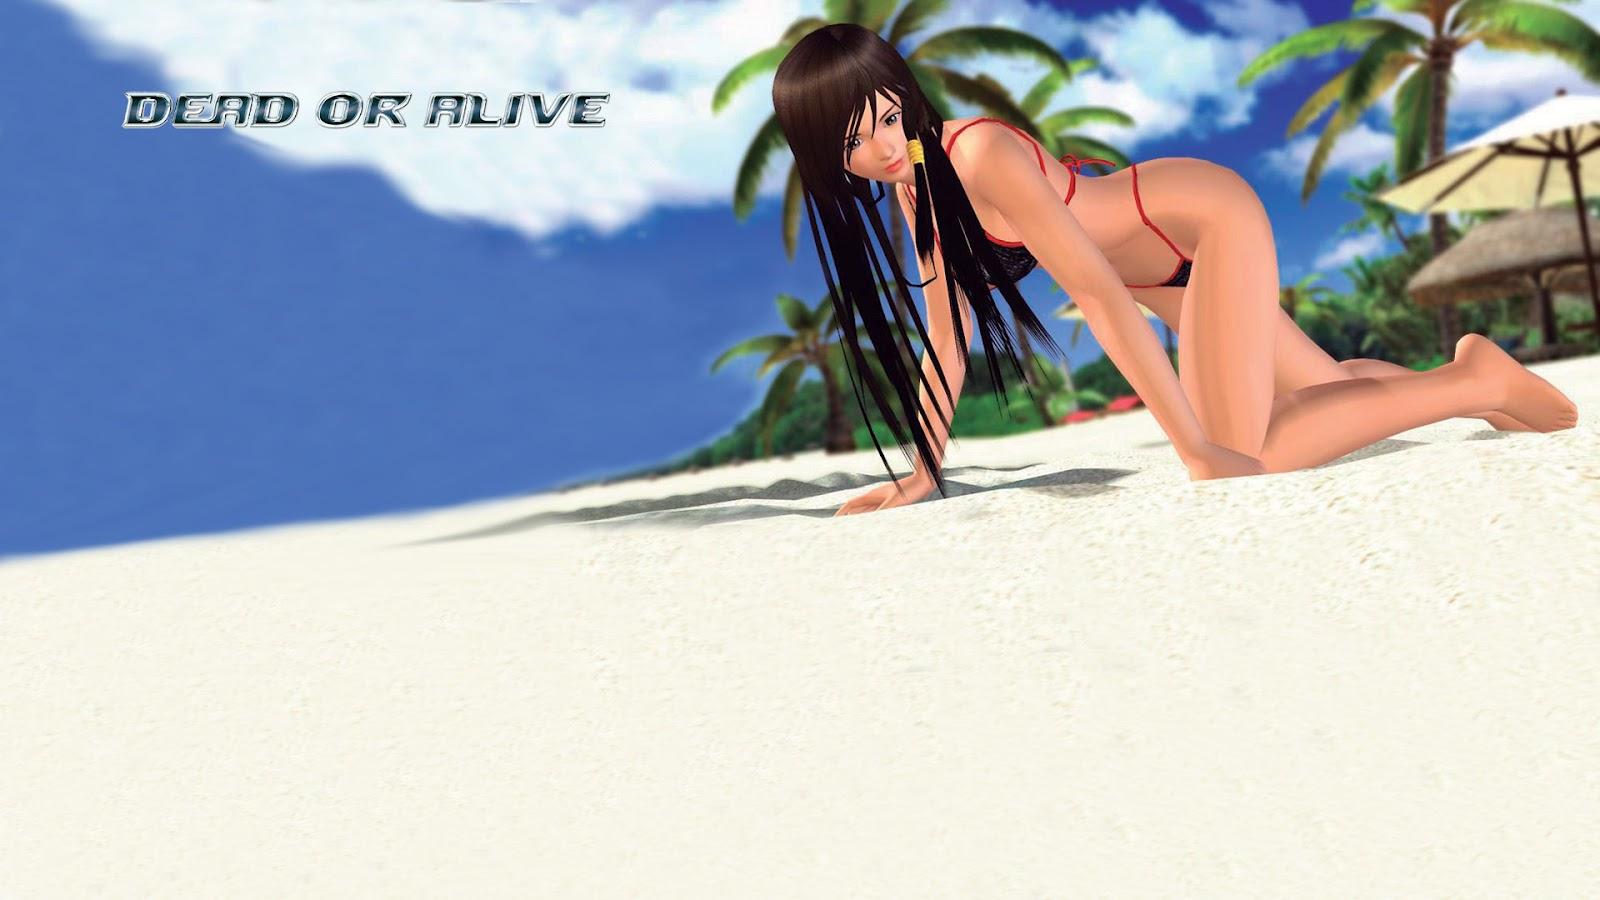 http://4.bp.blogspot.com/-S9hyGkAJXsU/UBdKDTdux5I/AAAAAAAAIcg/cpxWXE4bxSs/s1600/dead+or+alive+4+wallpapers+11.jpg